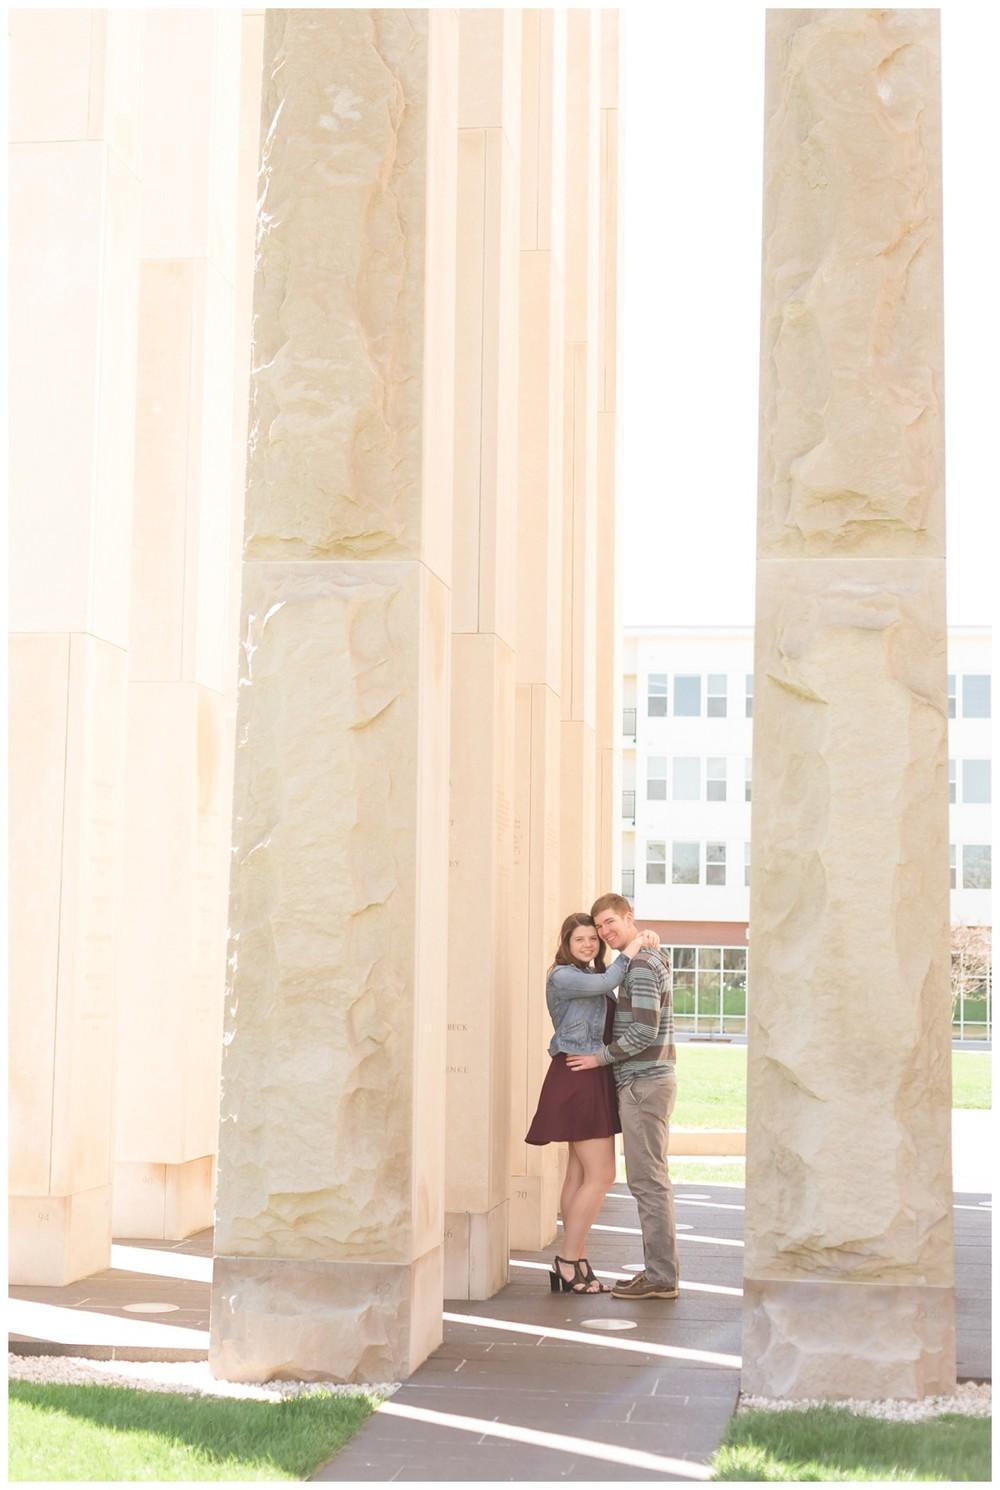 Brandon & Michaela Downtown Columbus Engagement Session24.jpg